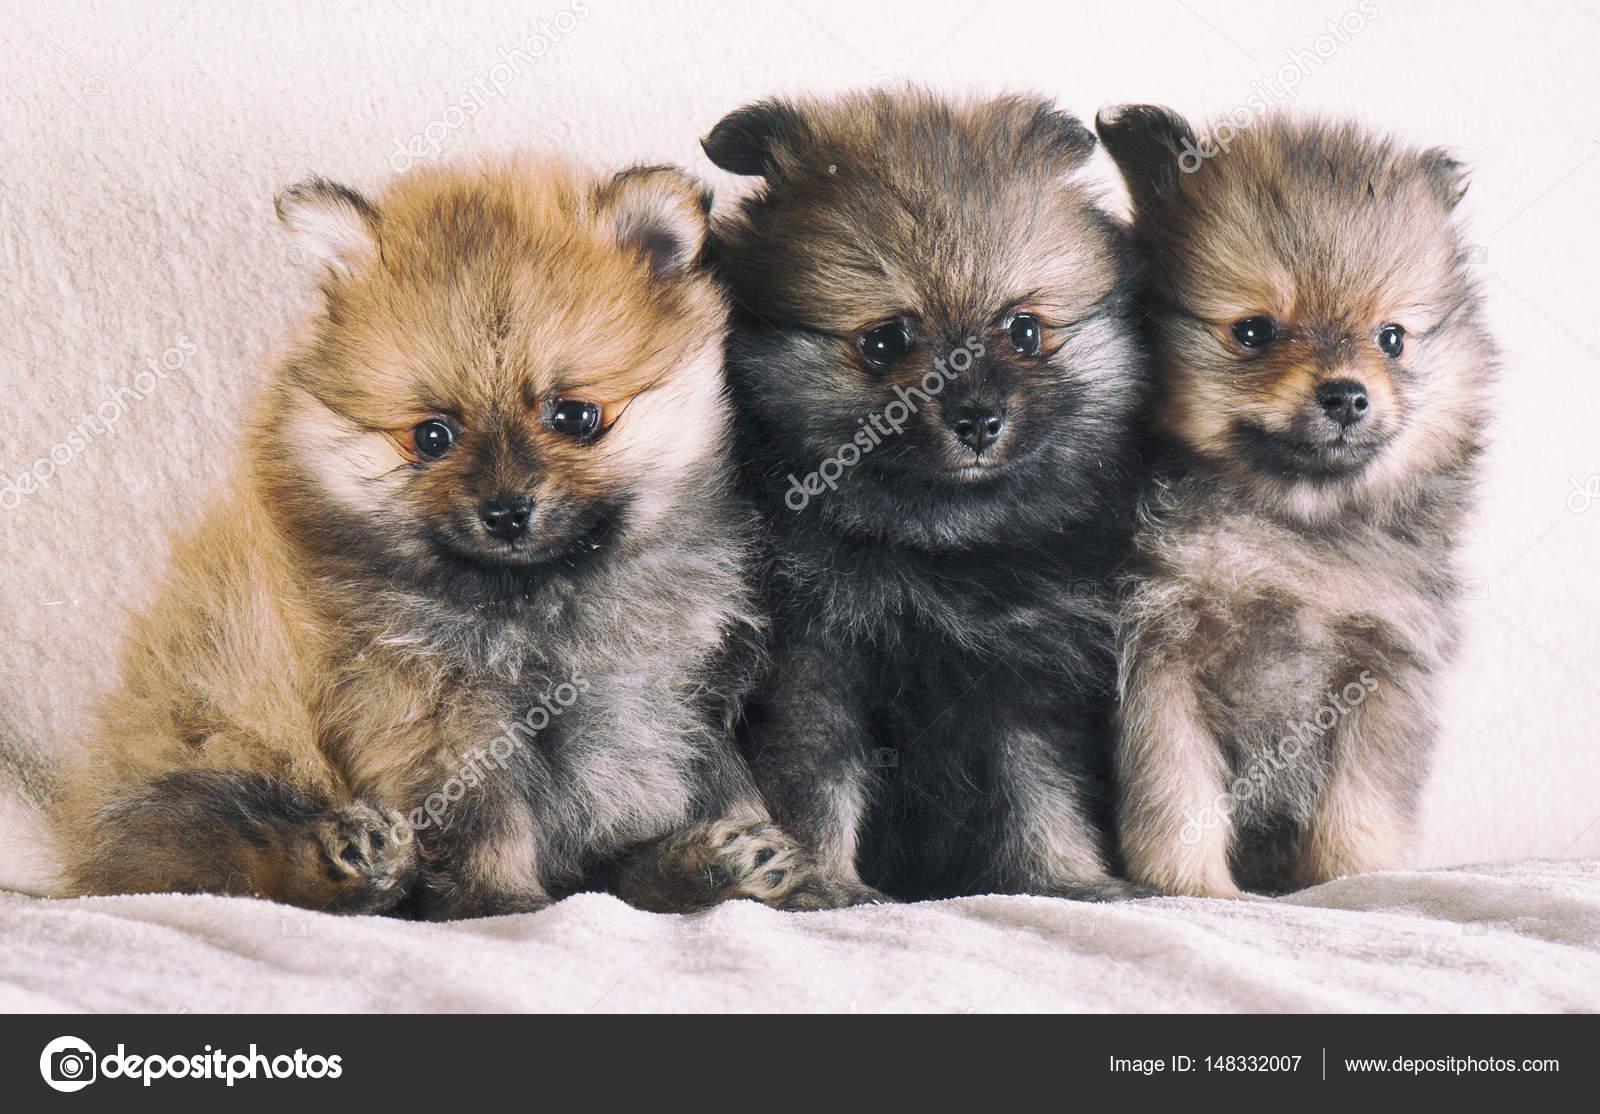 Cute Baby Pomeranian Puppies Adorable Pomeranian Spitz Puppies Stock Photo C Fotomolos 148332007